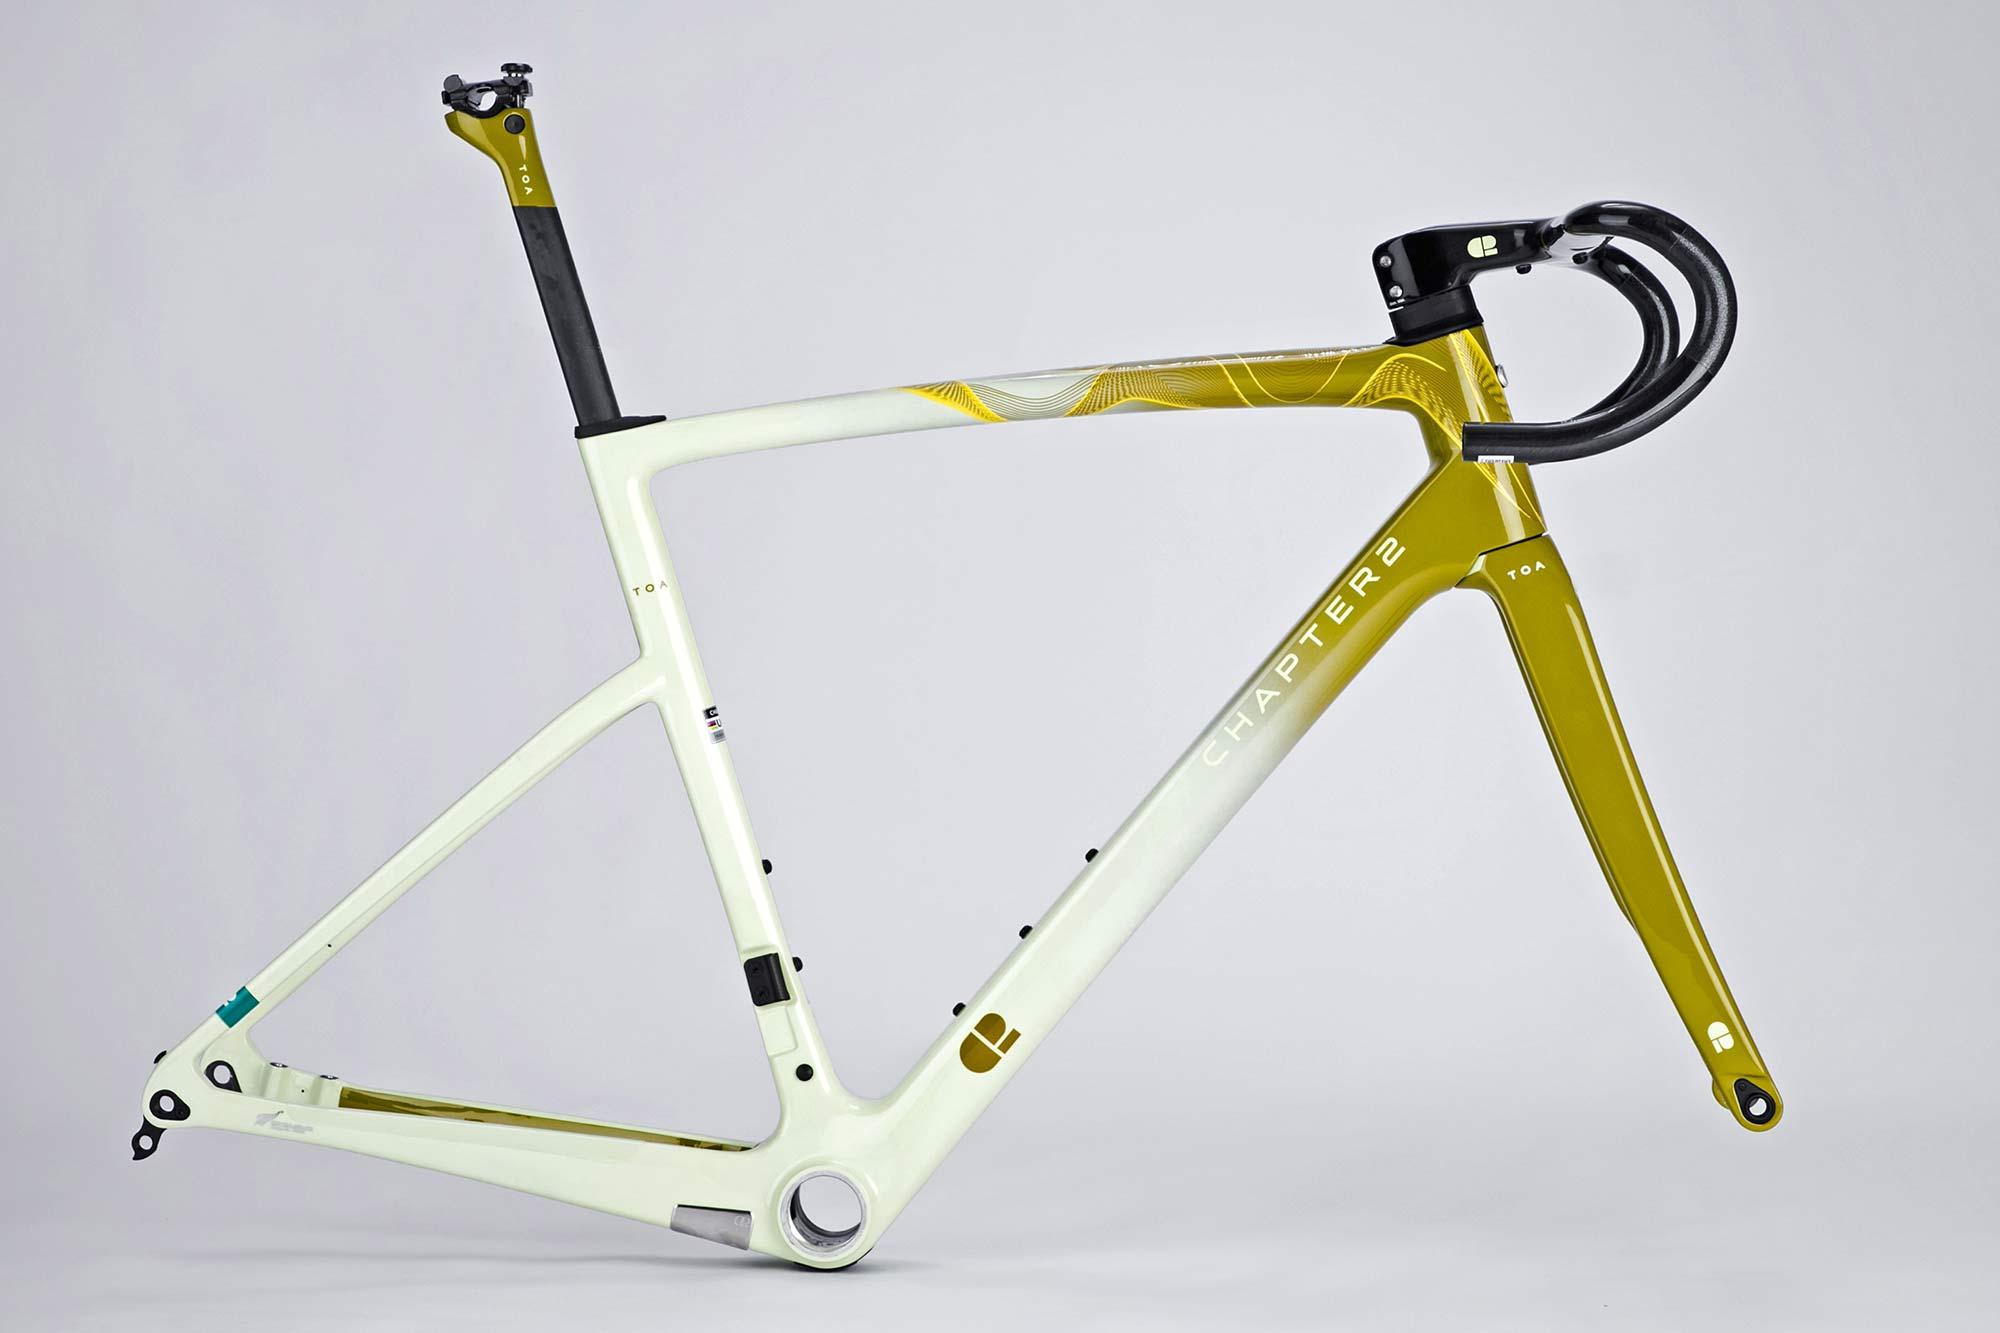 Chapter2 TOA all-road bike, fully integrated versatile aero carbon road bike,Tongariro frameset